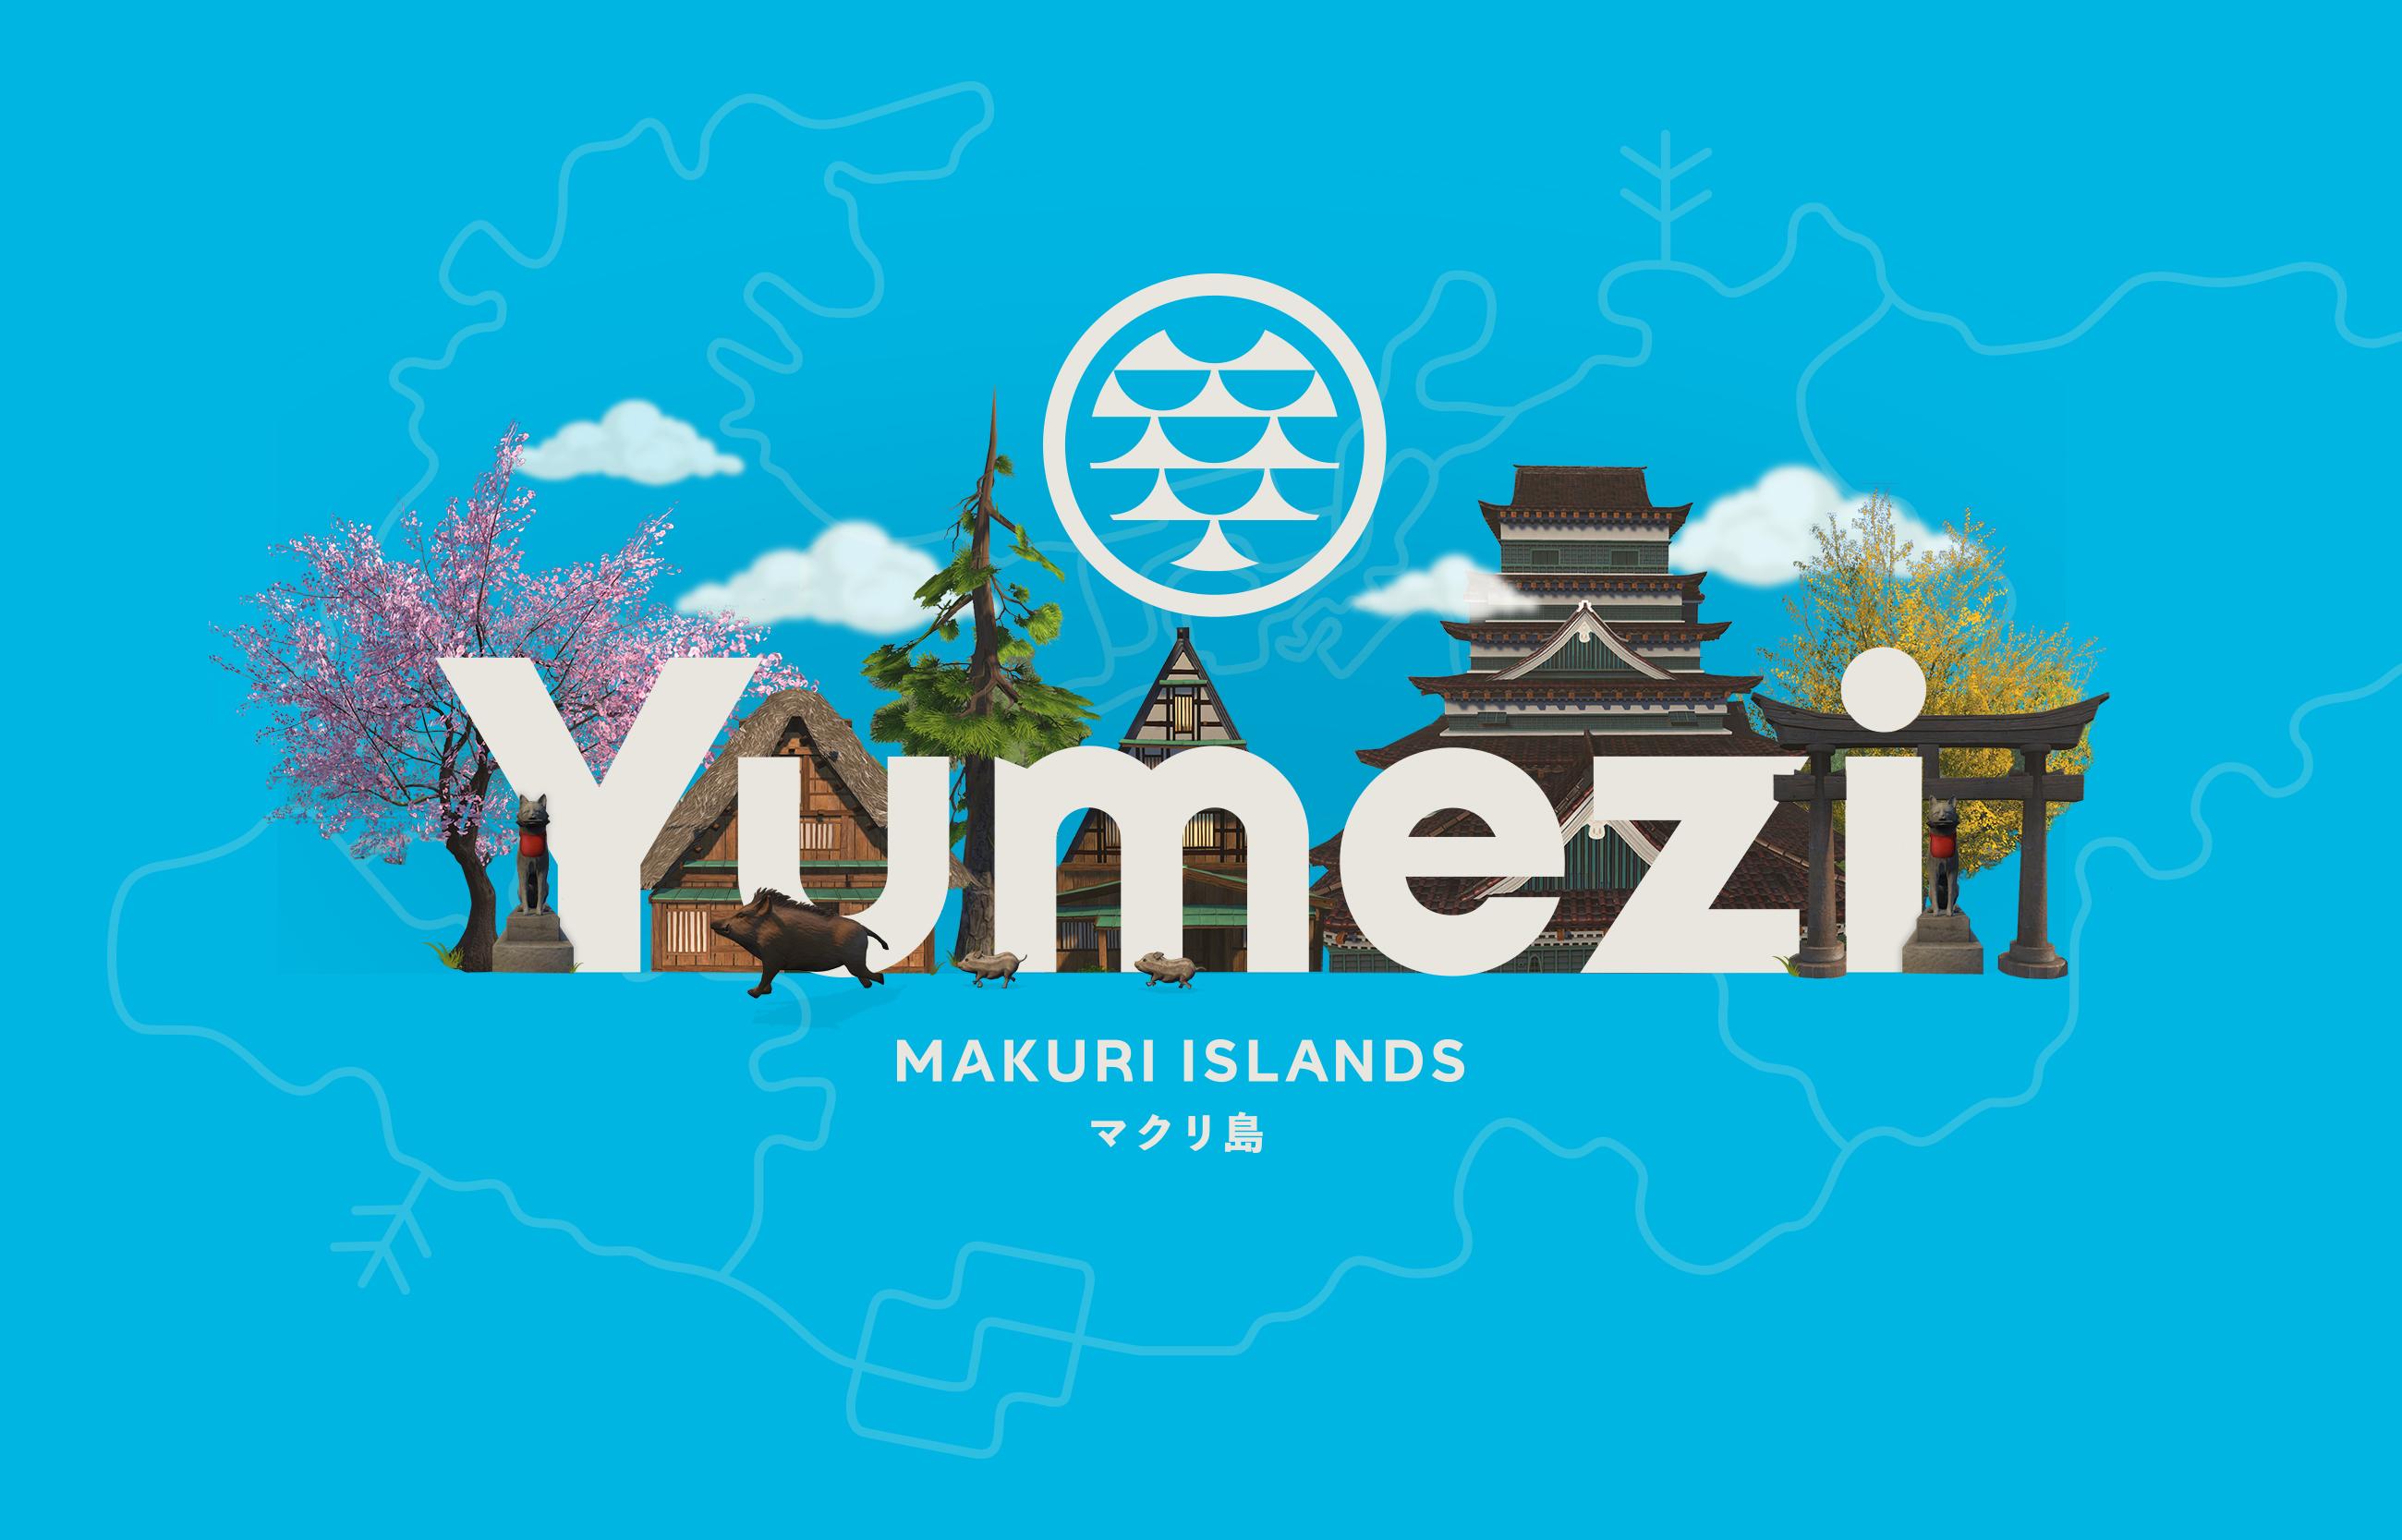 yumezi_pr_branded_image.jpg